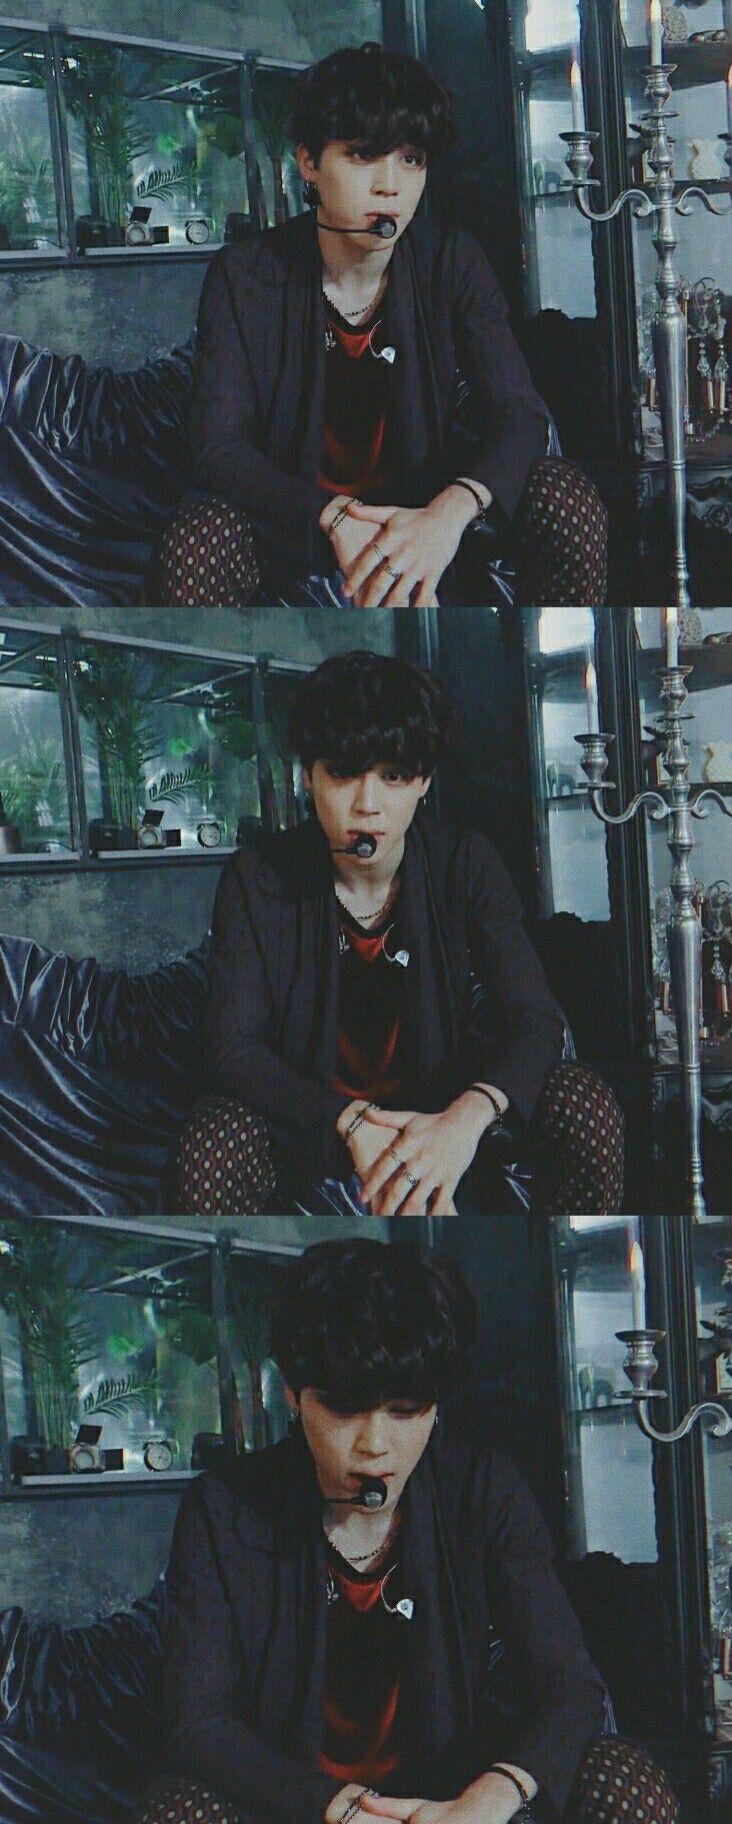 #JIMIN // [BANGTAN BOMB] Who gets up at the end? - BTS (방탄소년단)